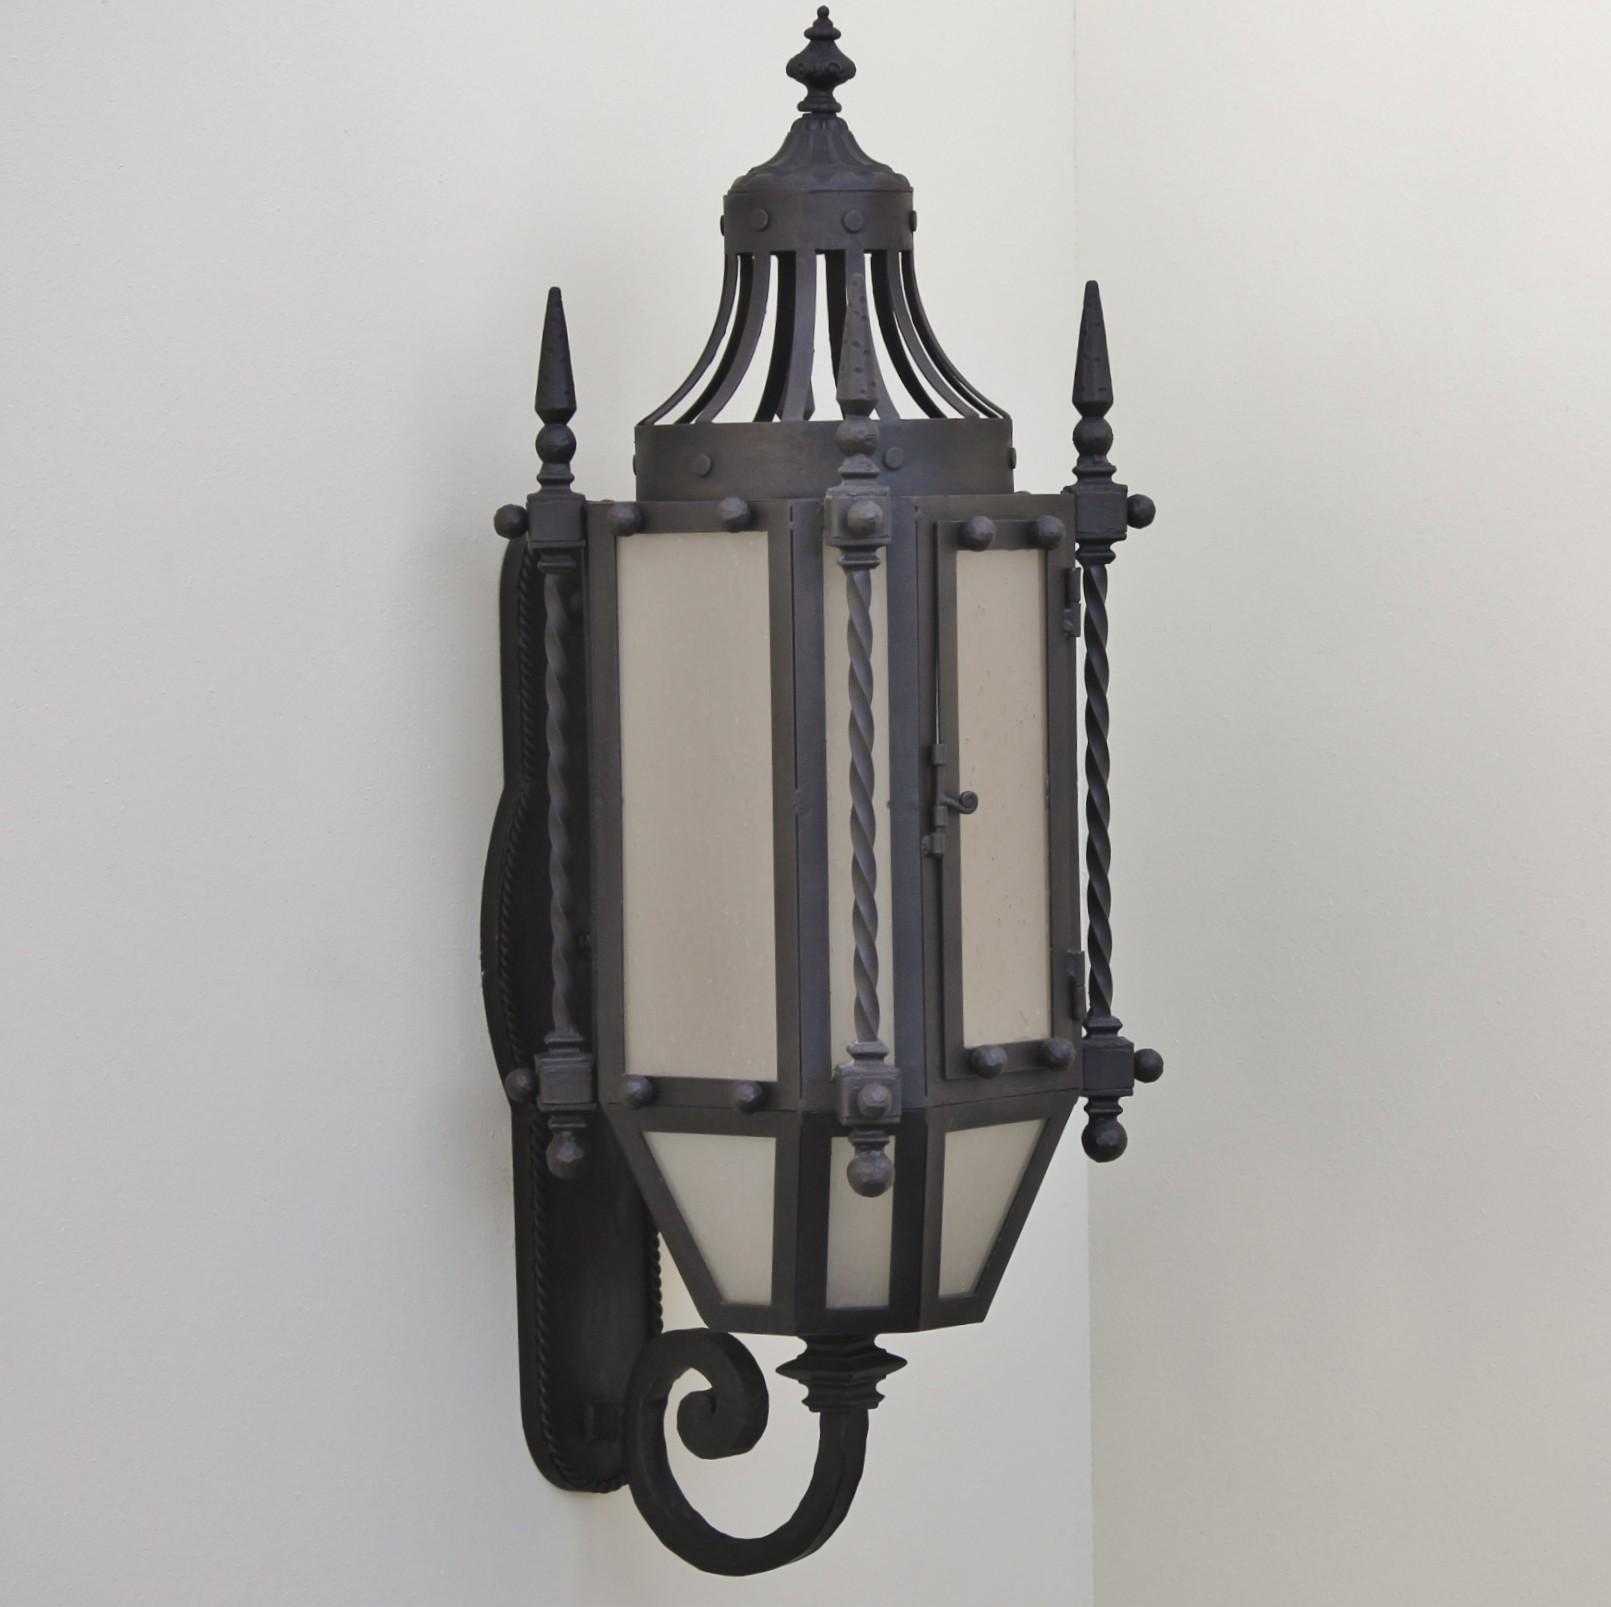 Gothic Lighting Fixtures Lighting Ideas